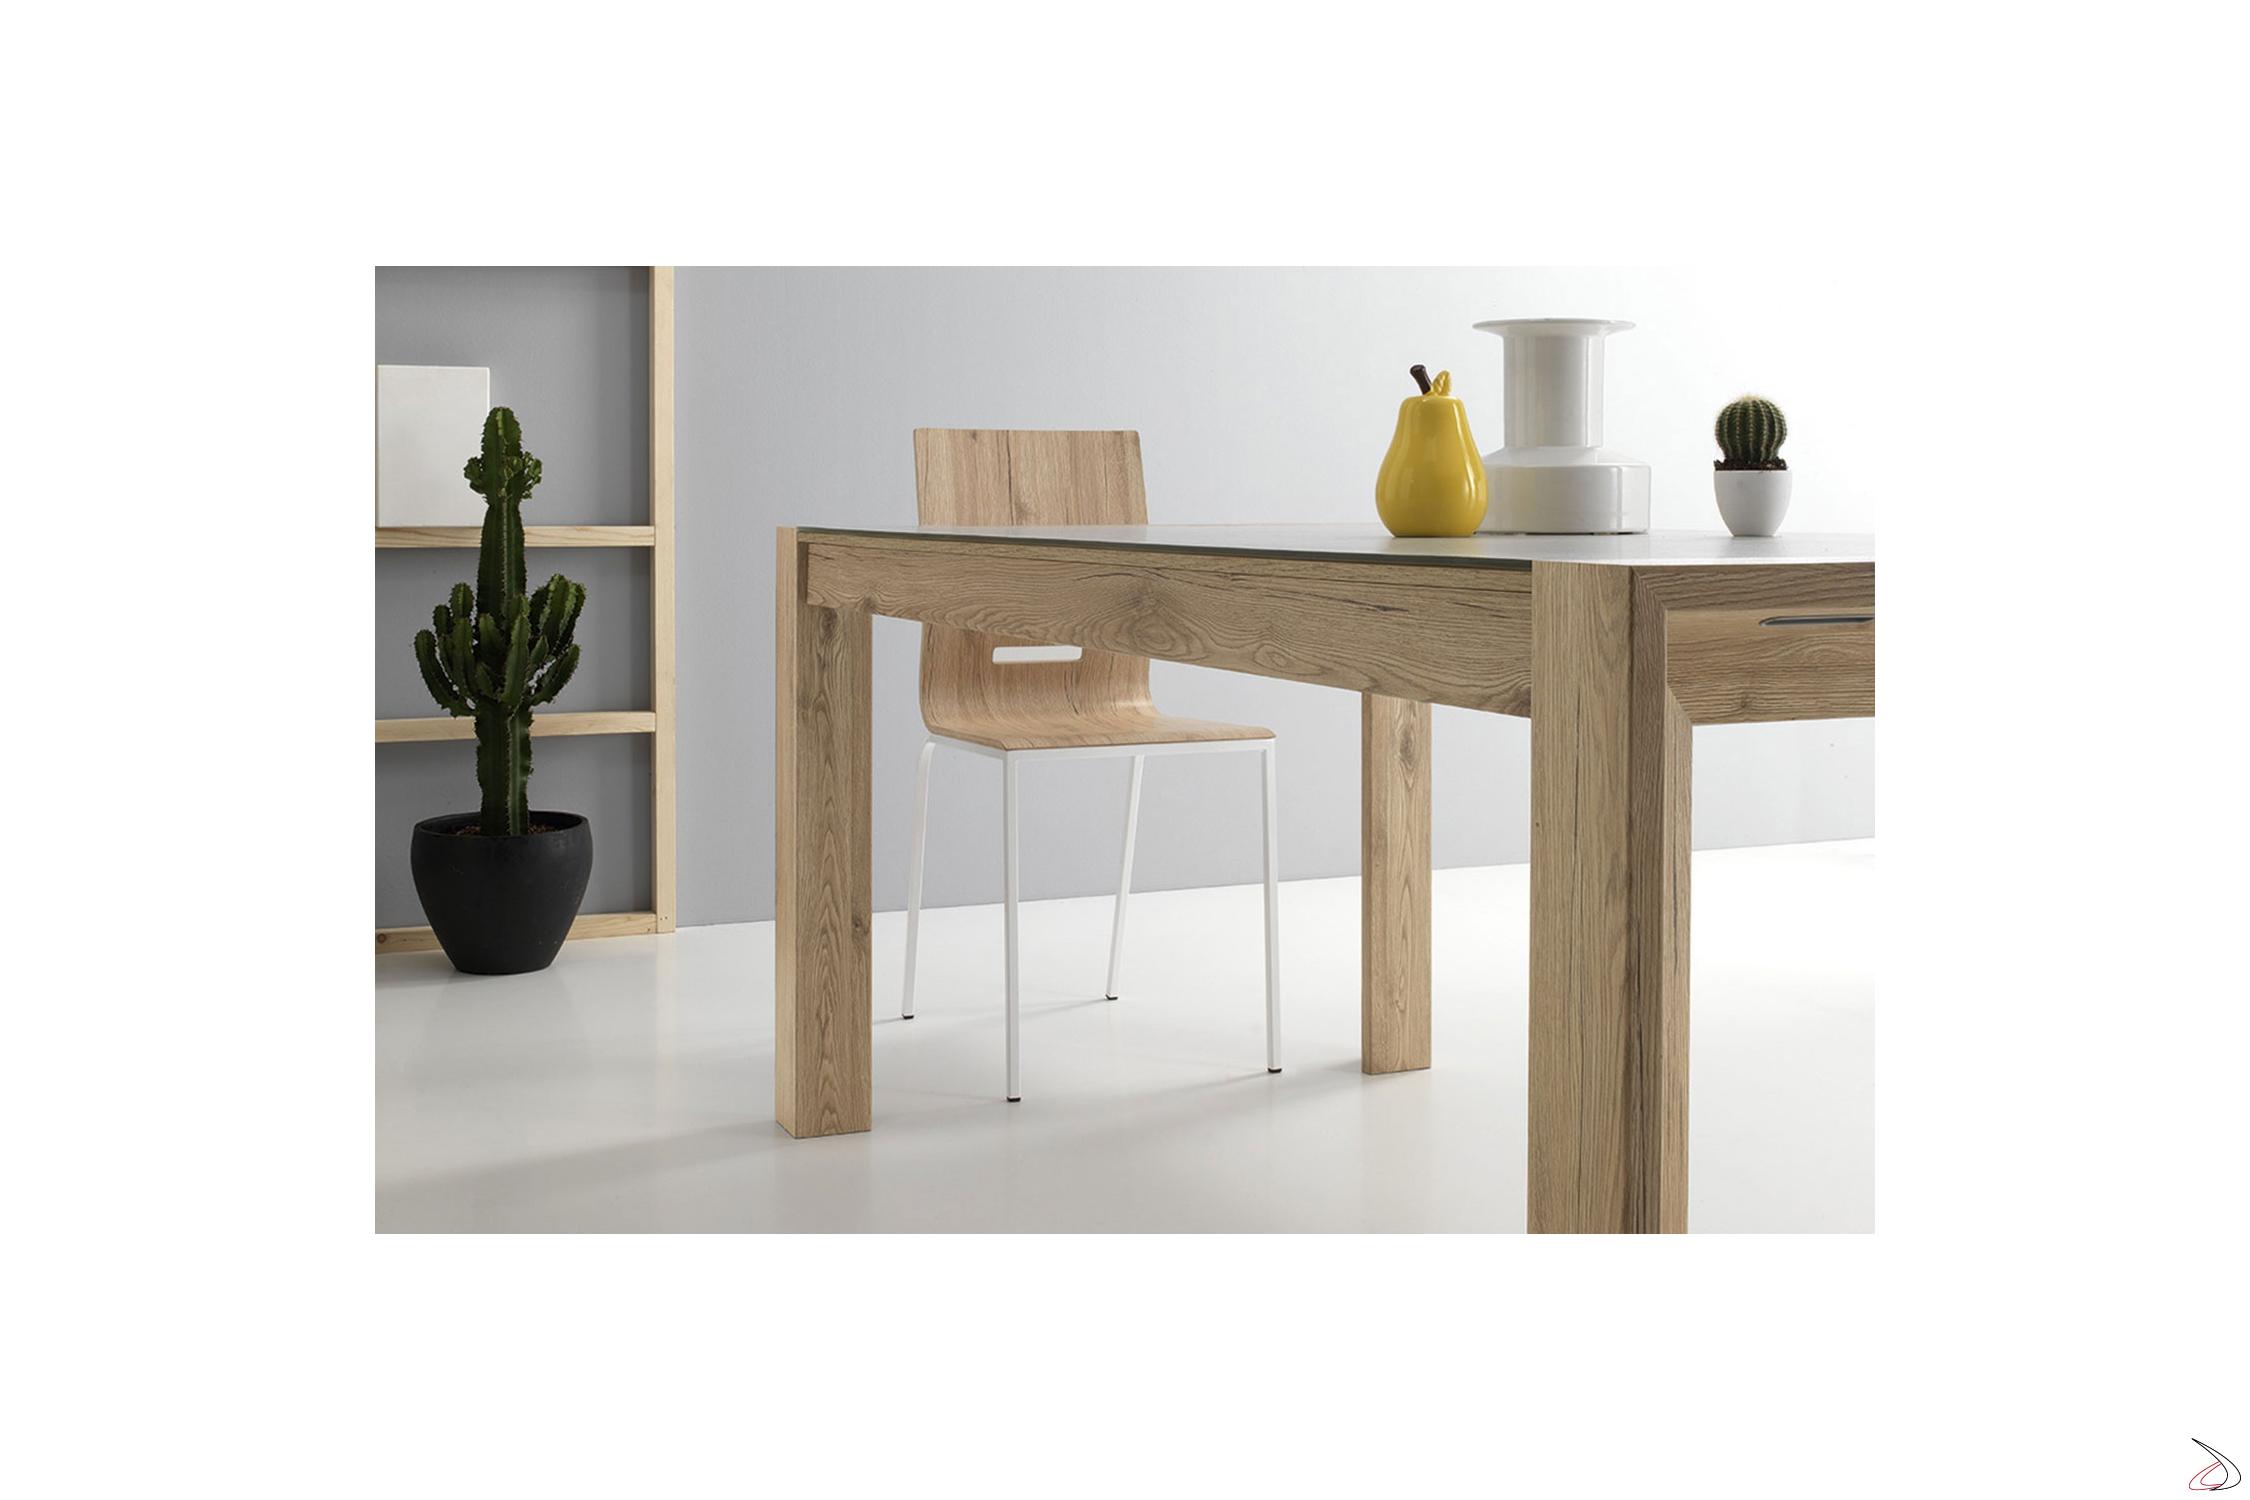 Tavolo Allungabile 4 Metri.Milano Living Room Table With An Elegant And Compact Design